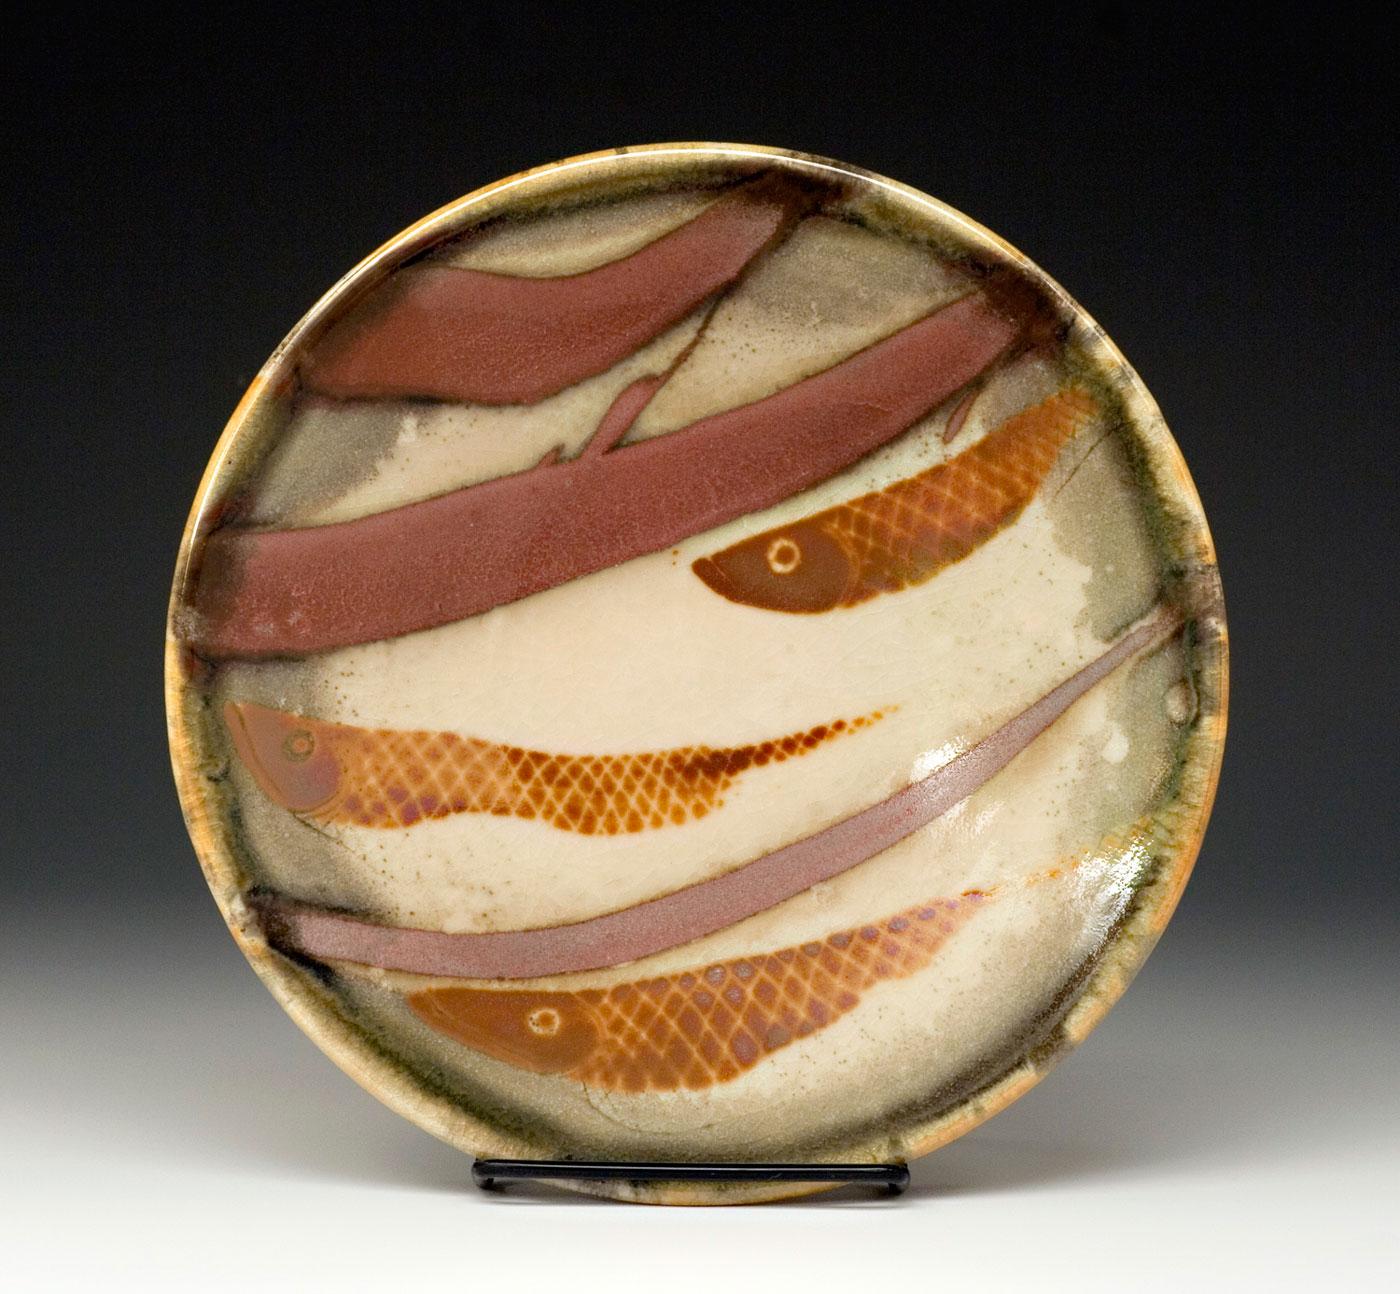 Fish-Shino-Glaze-Plate-Bruce-Gholson.jpg